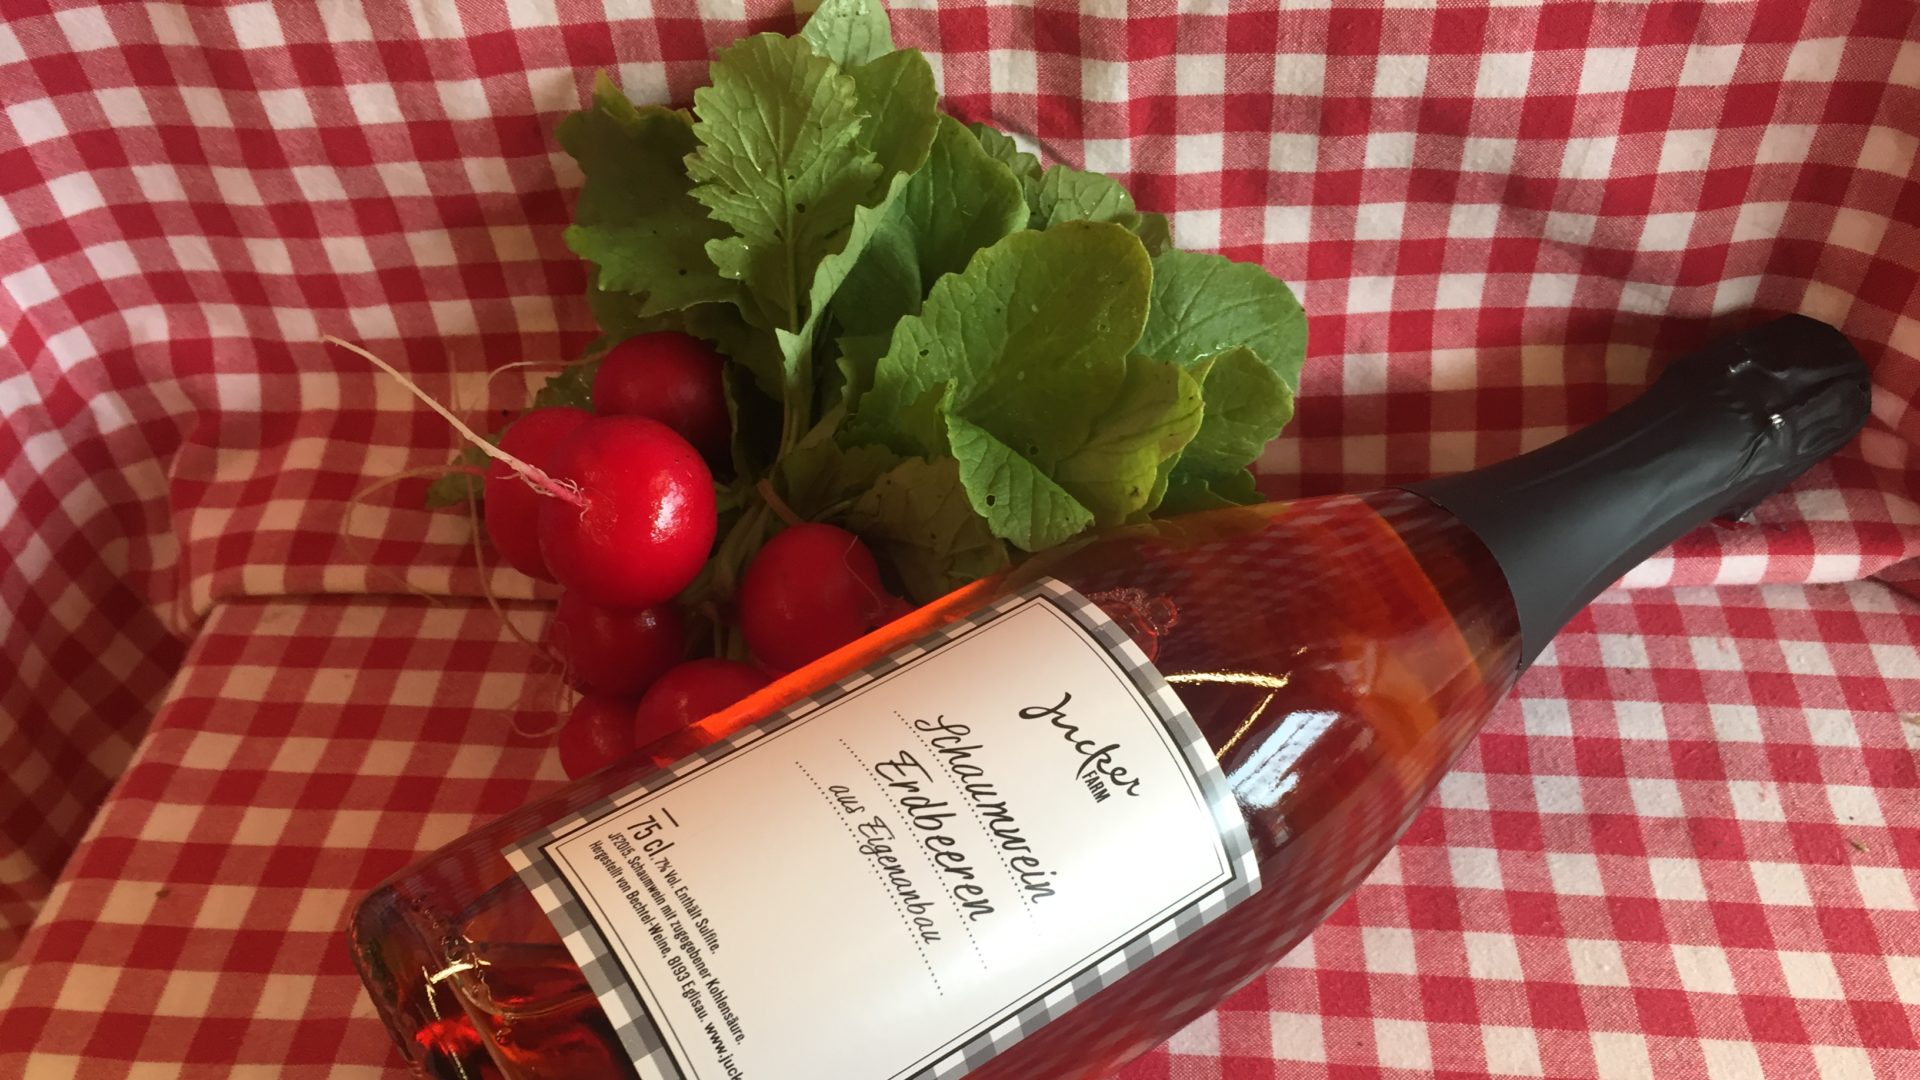 Erdbeer Schaumwein